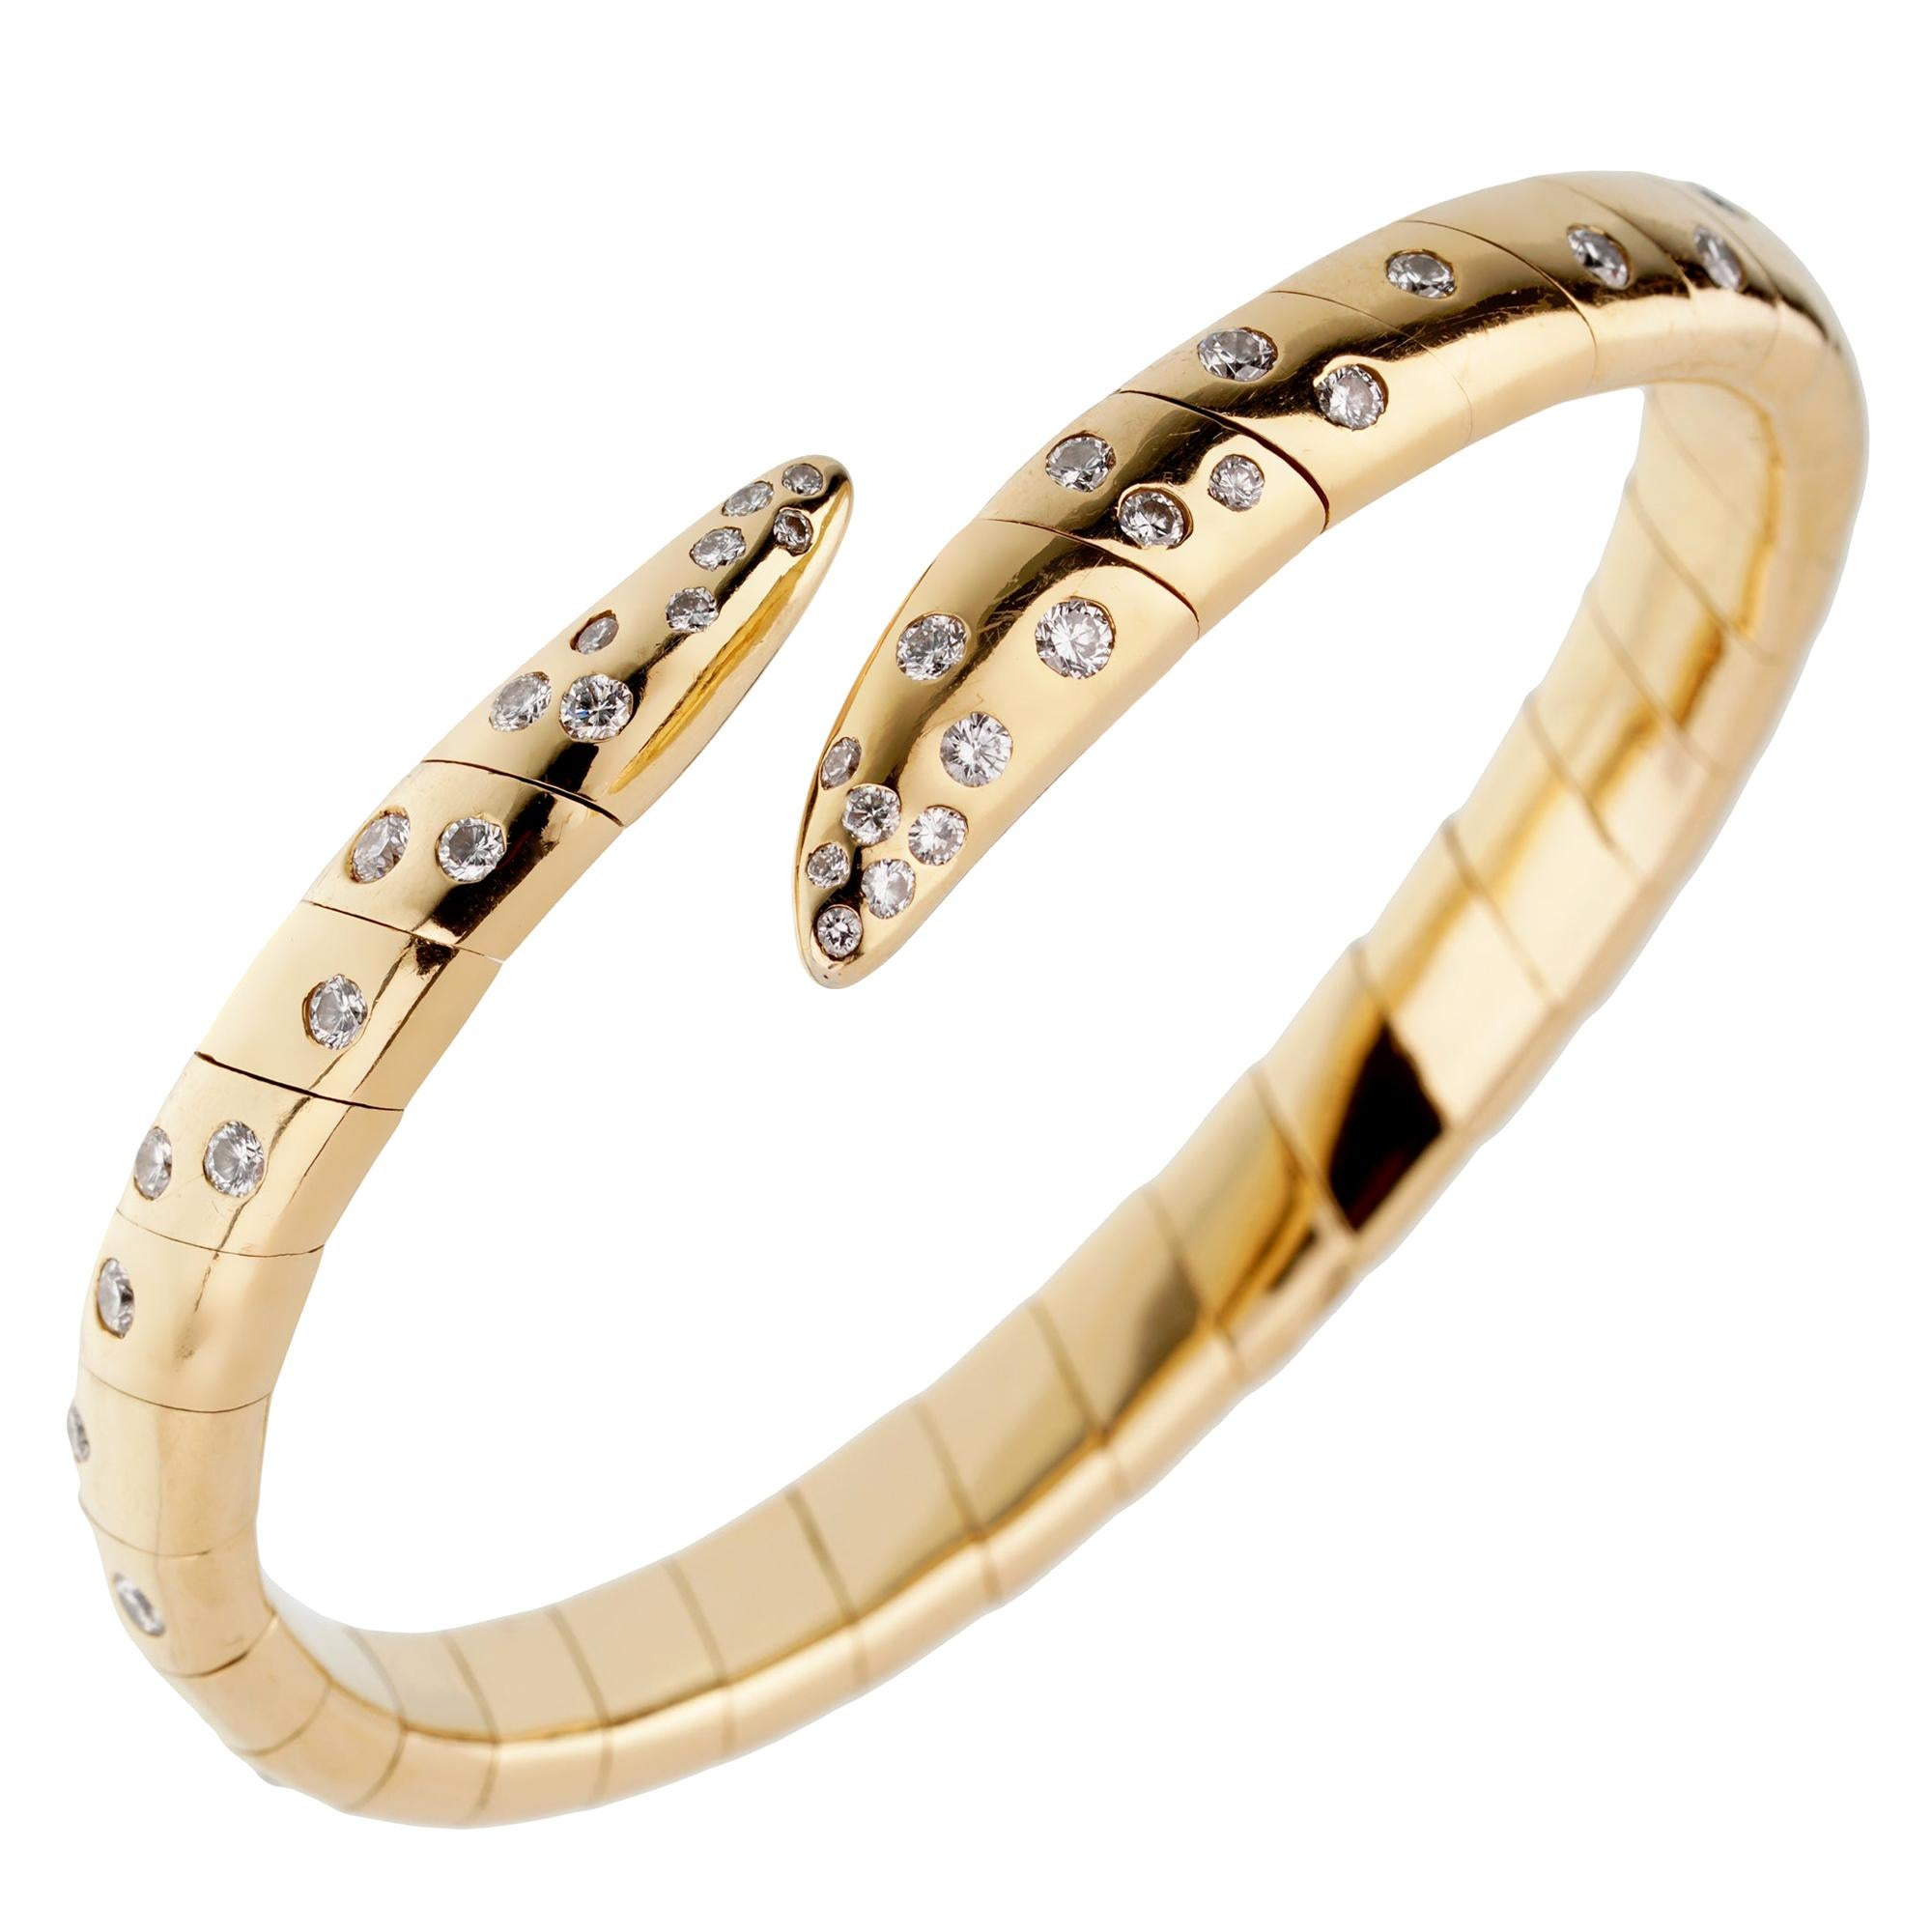 Boucheron Vintage Yellow Gold Diamond Cuff Bangle Bracelet